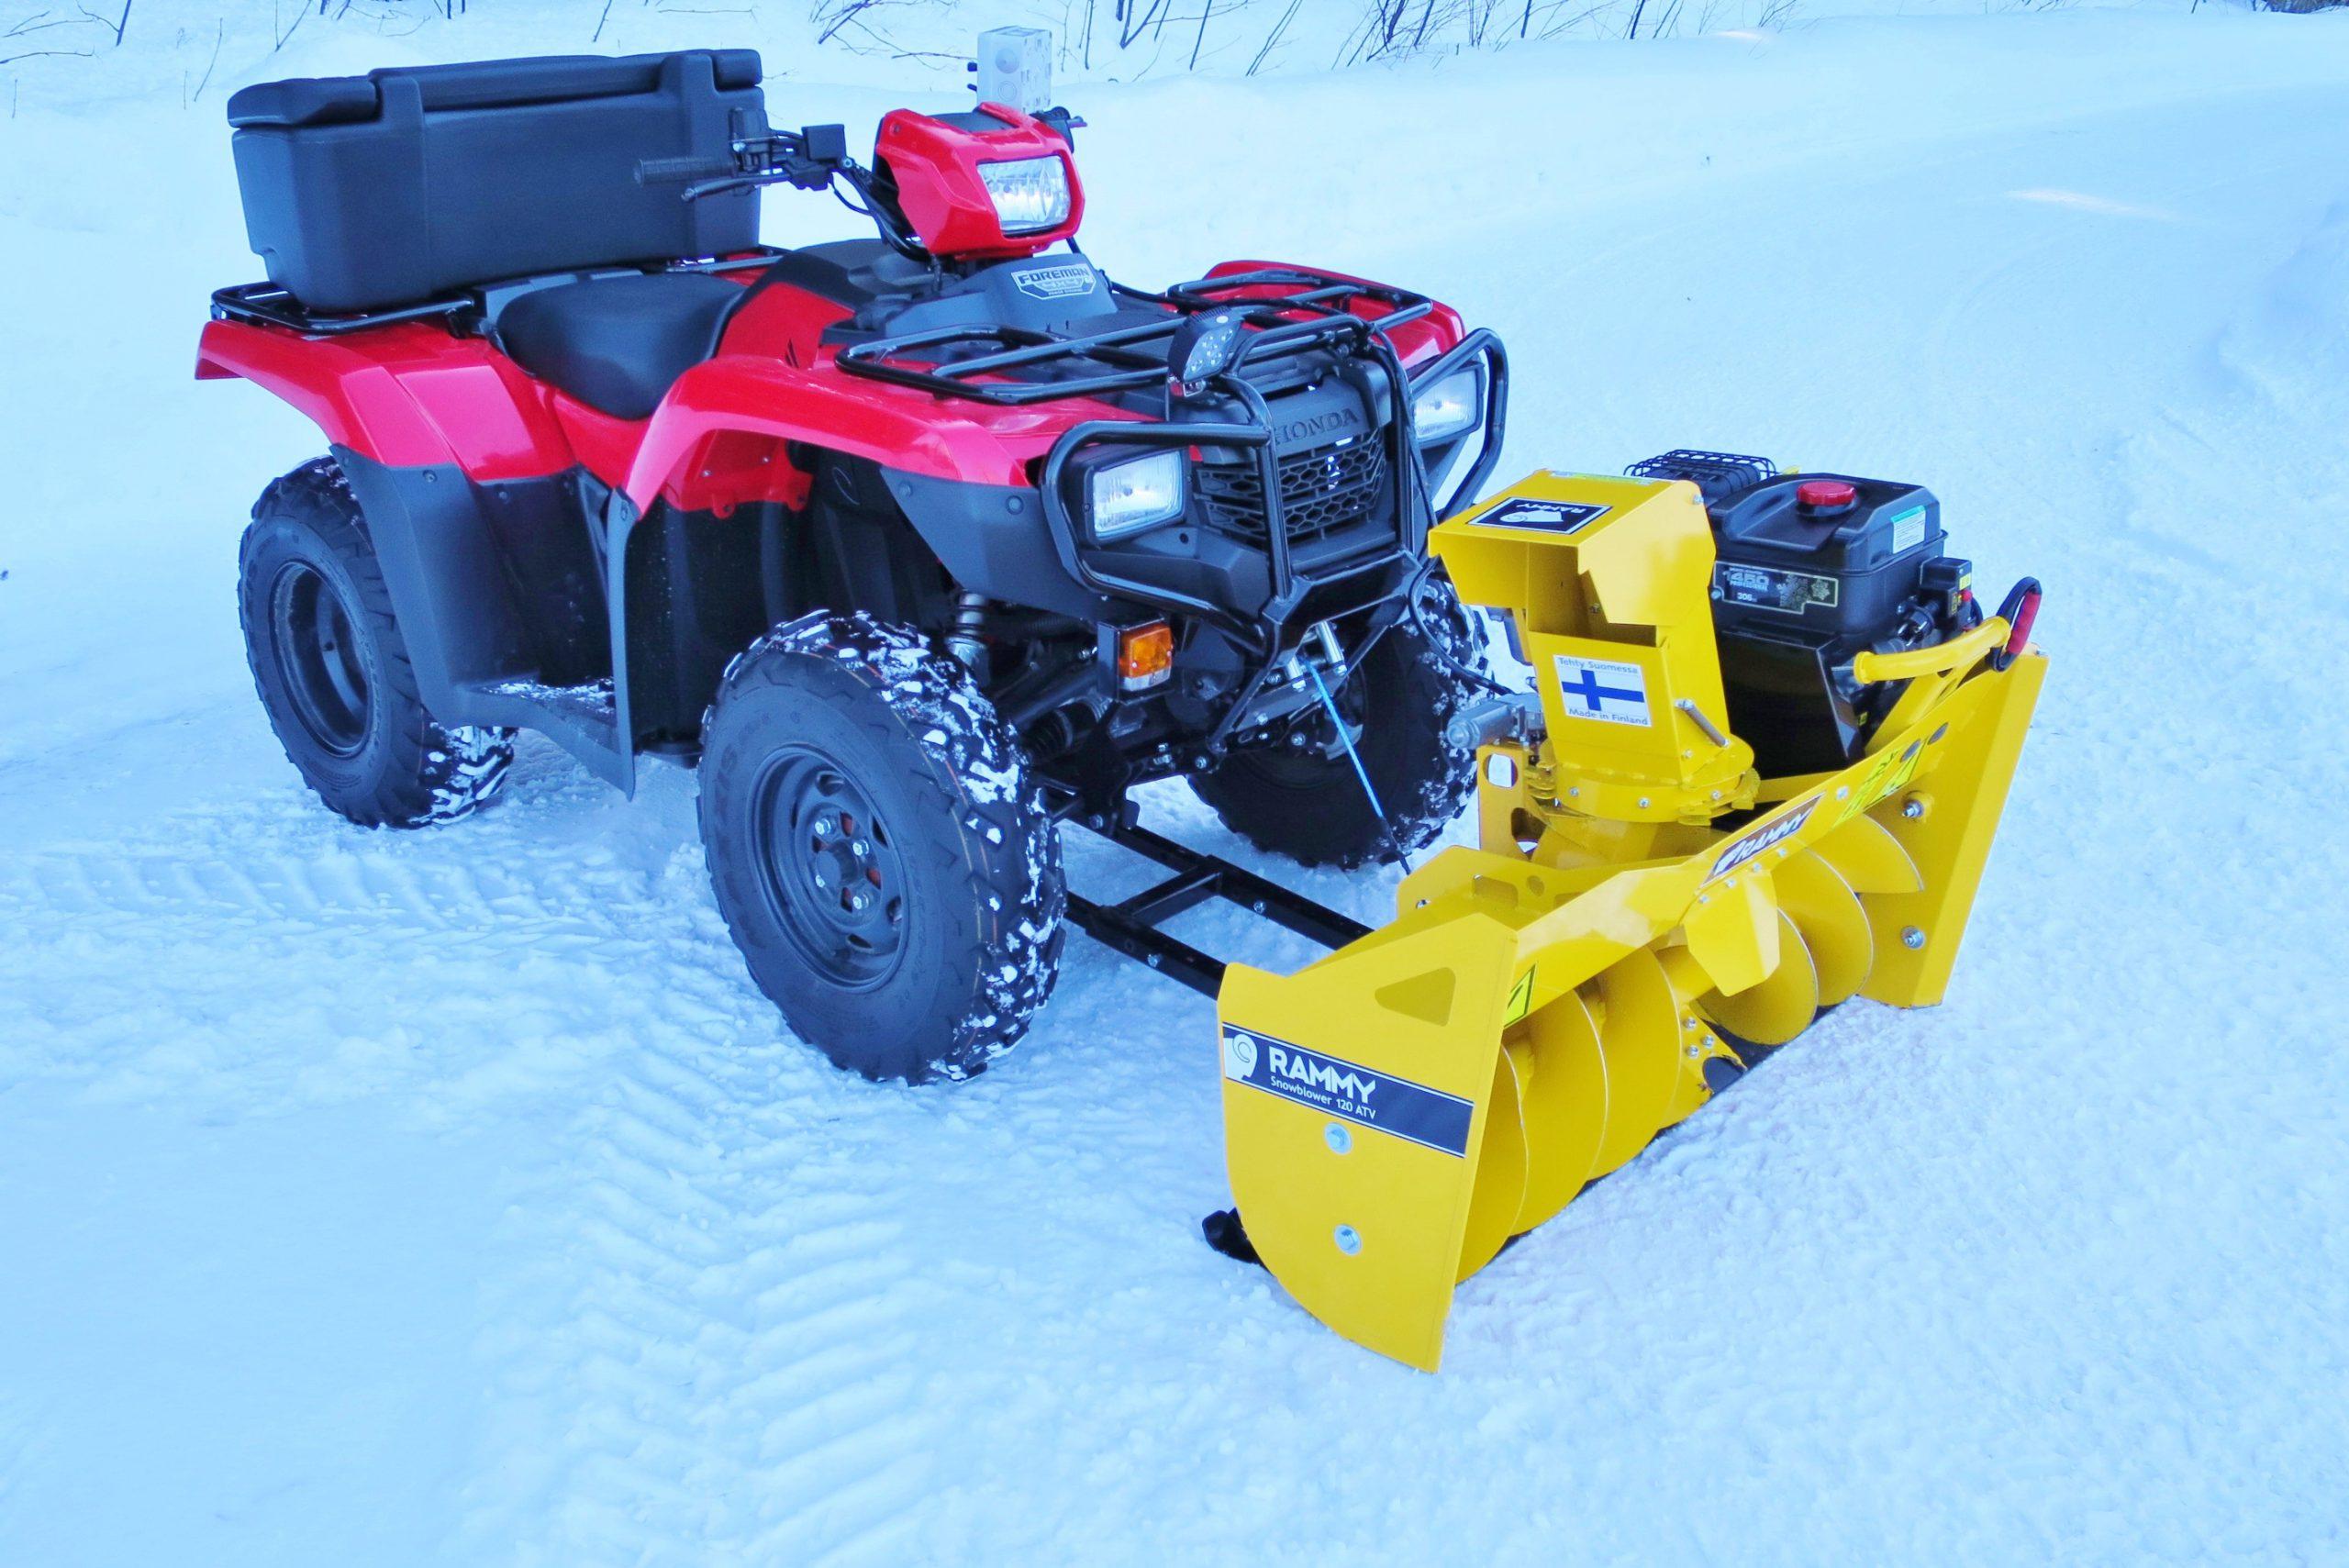 rammy snowblower 120 atv ec 306 cm3 electric start electric